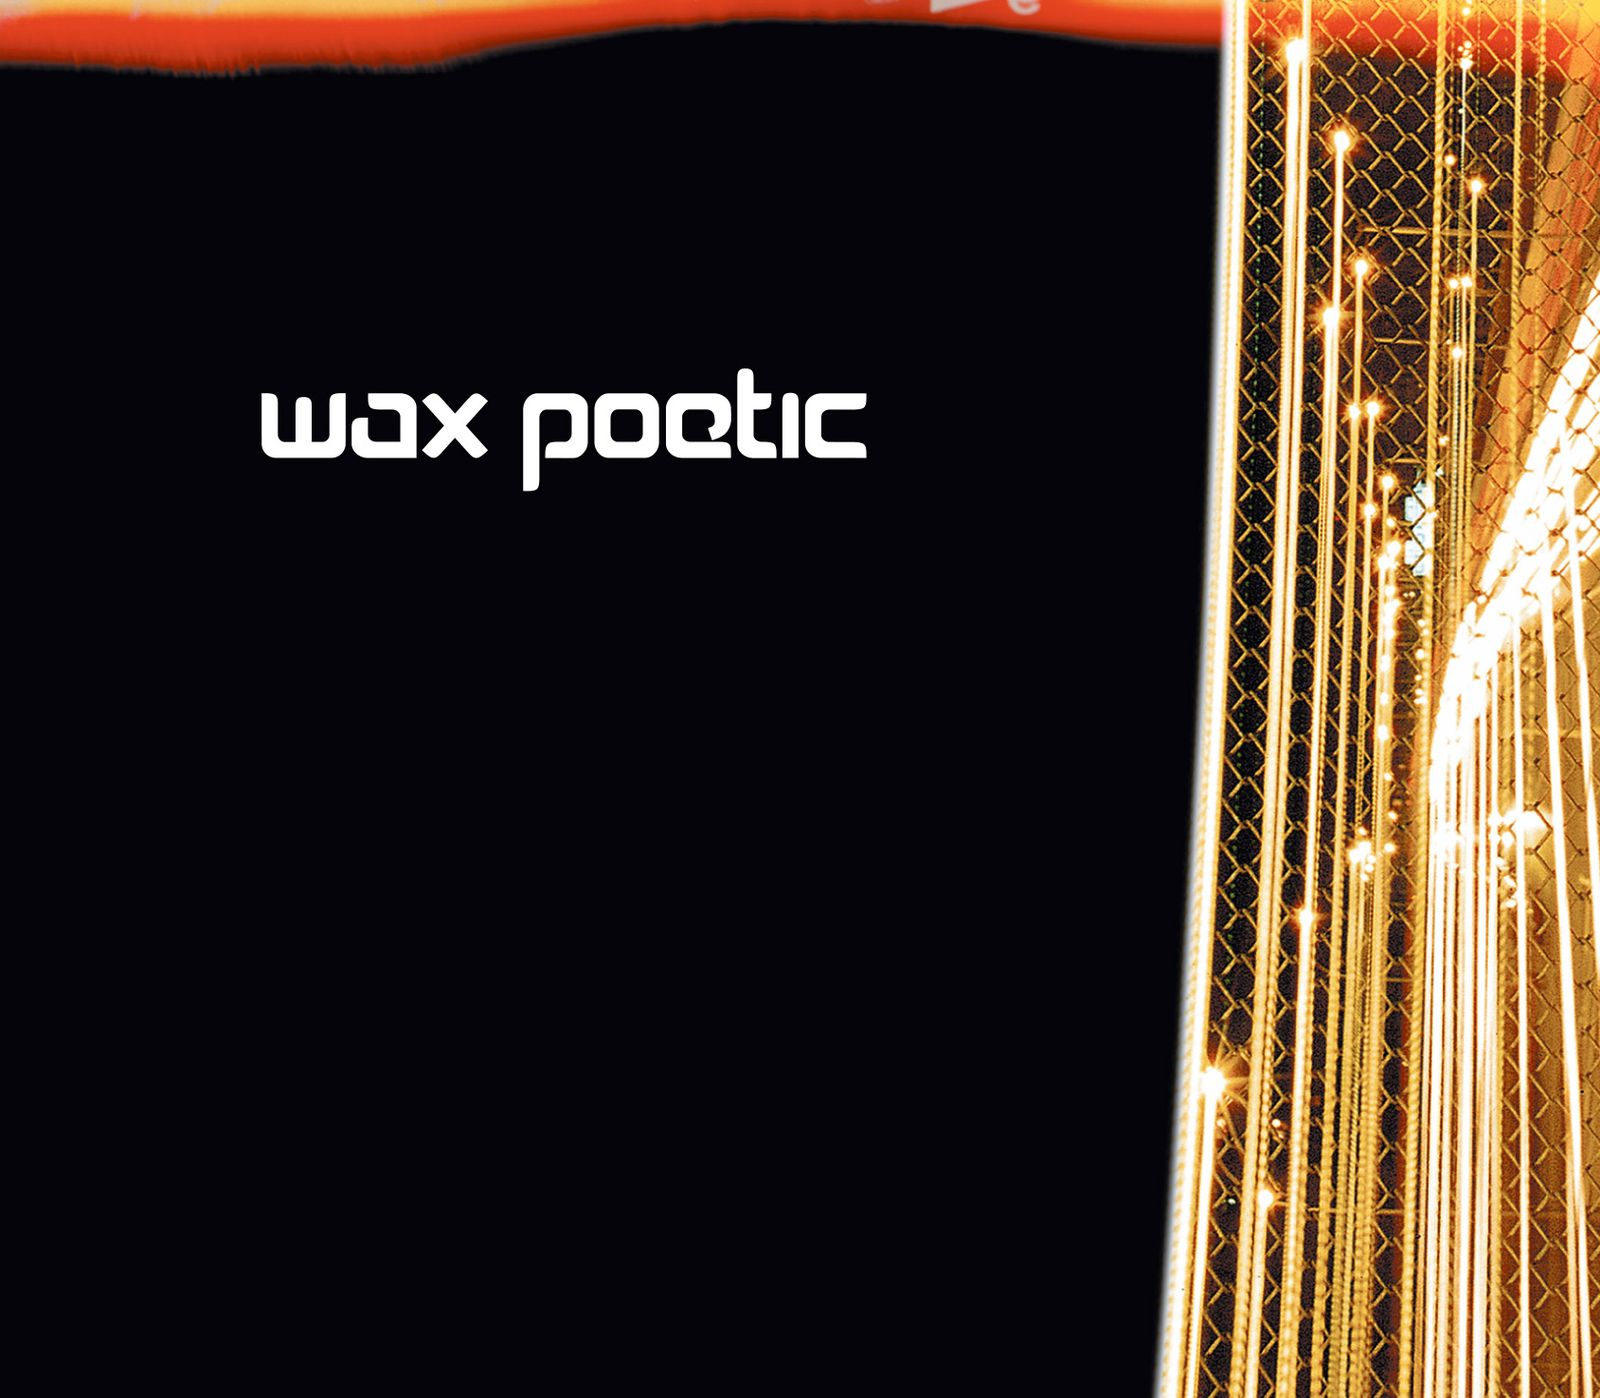 Wax Poetic. Wax Poetic catriona cotterill poetic escapes